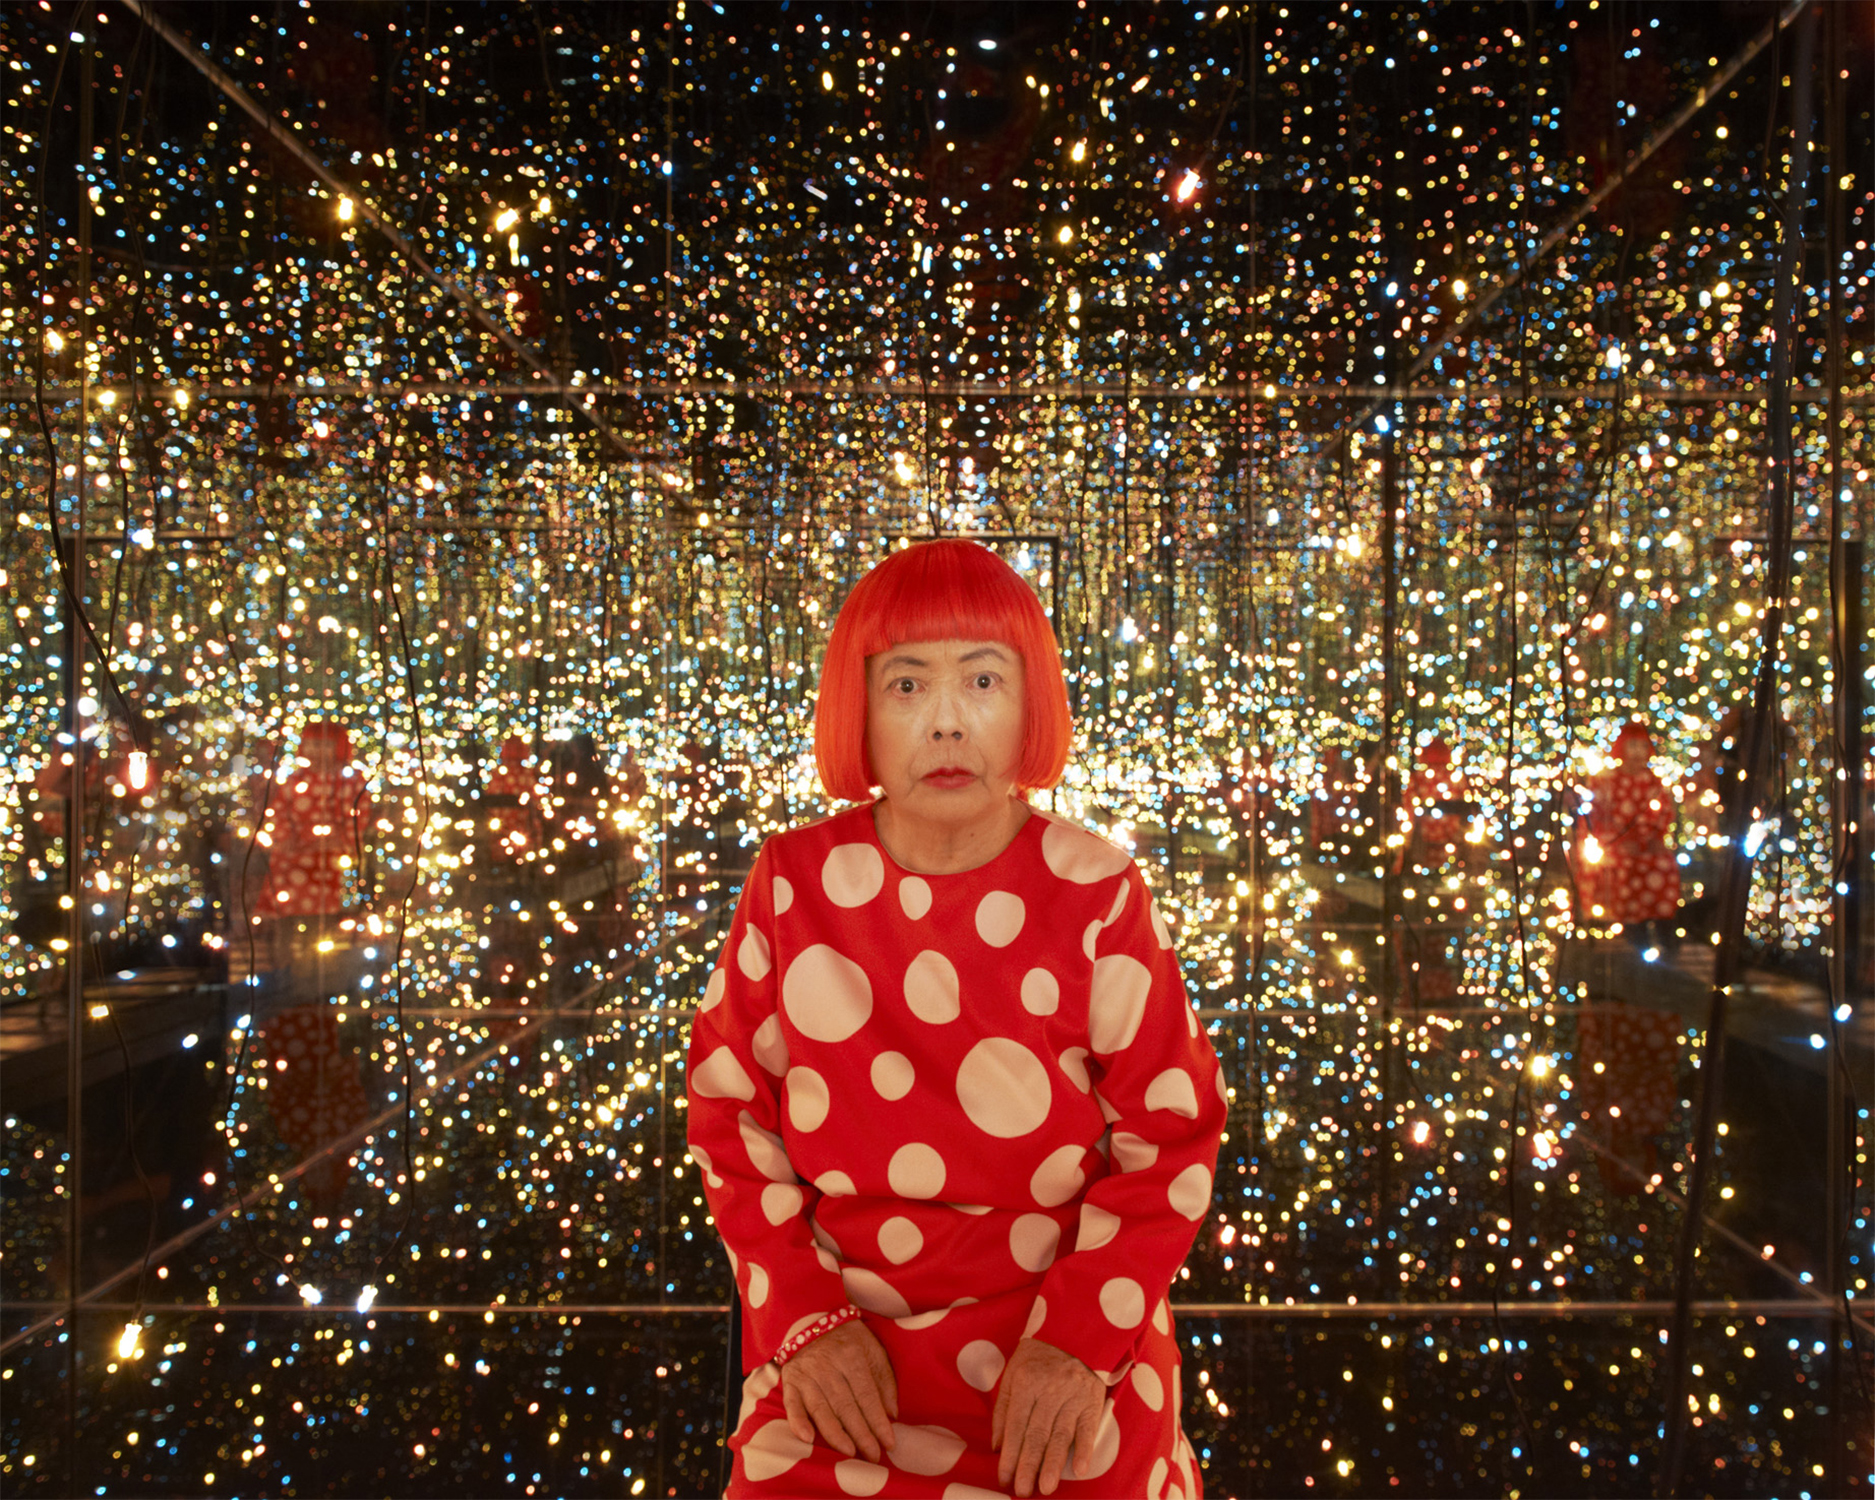 Yayoi Kusama, 2012 New York, New York